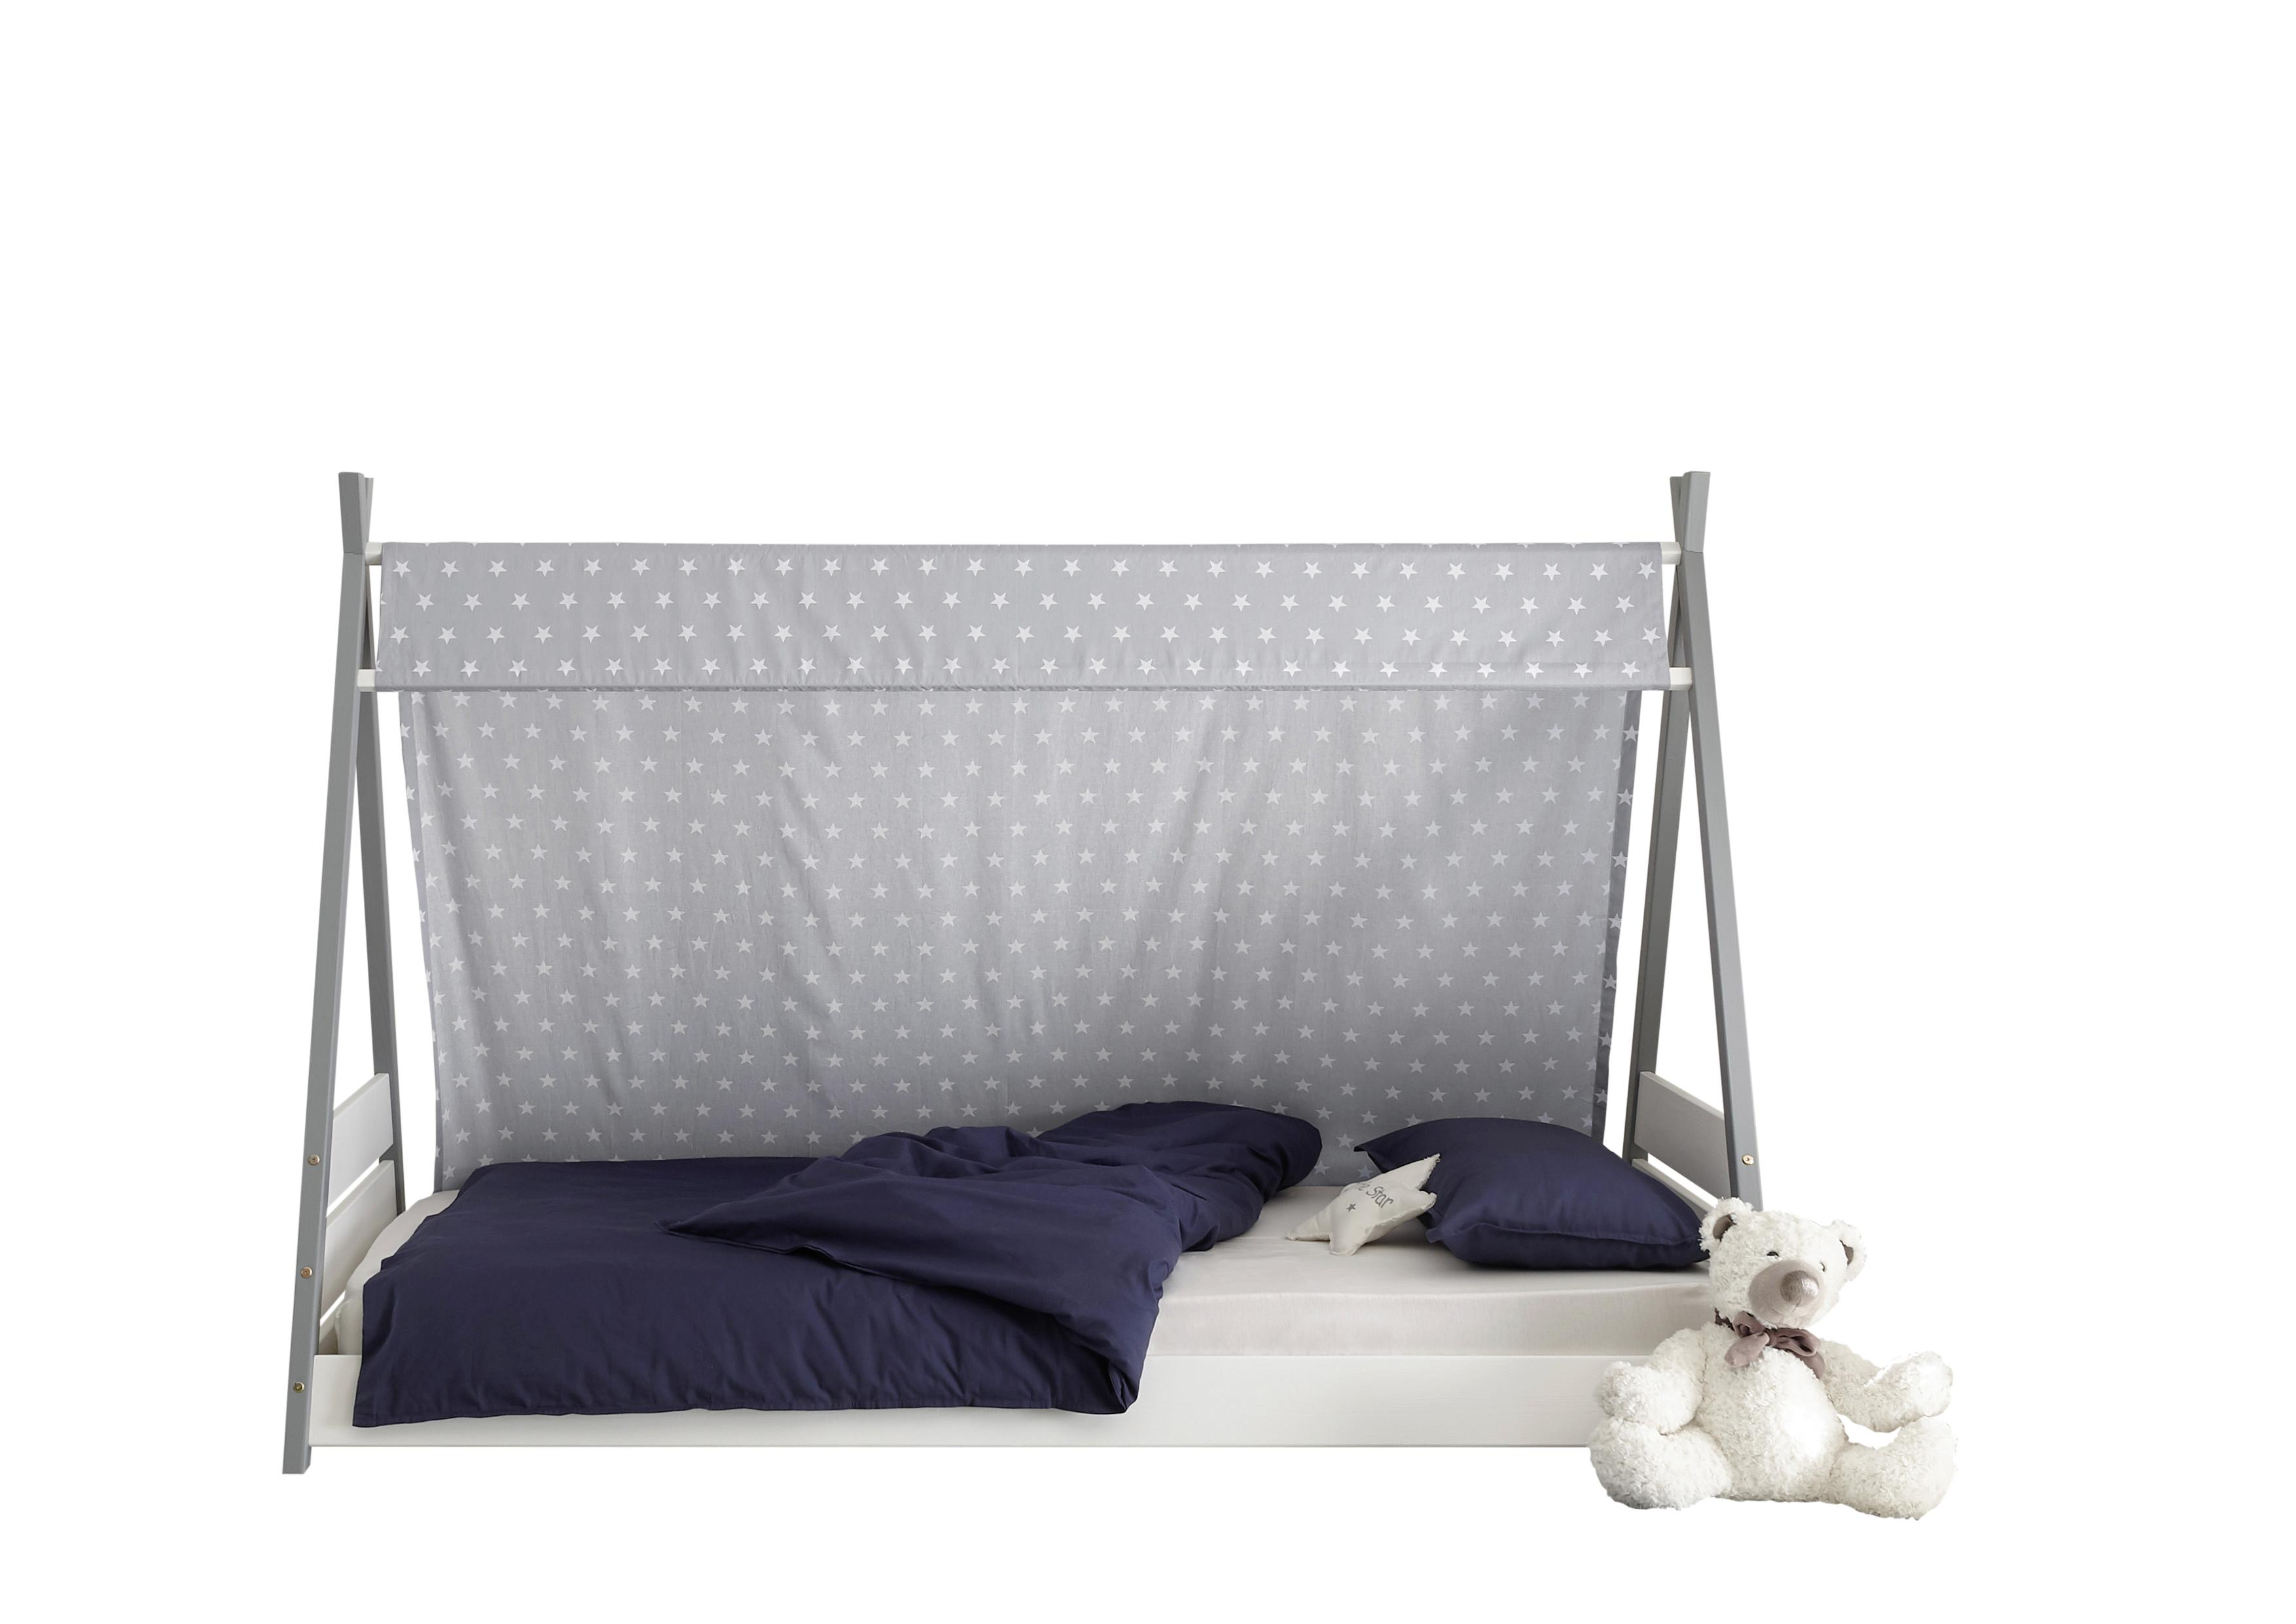 Image of Bett aus Kiefer massiv ca. 90x200cm